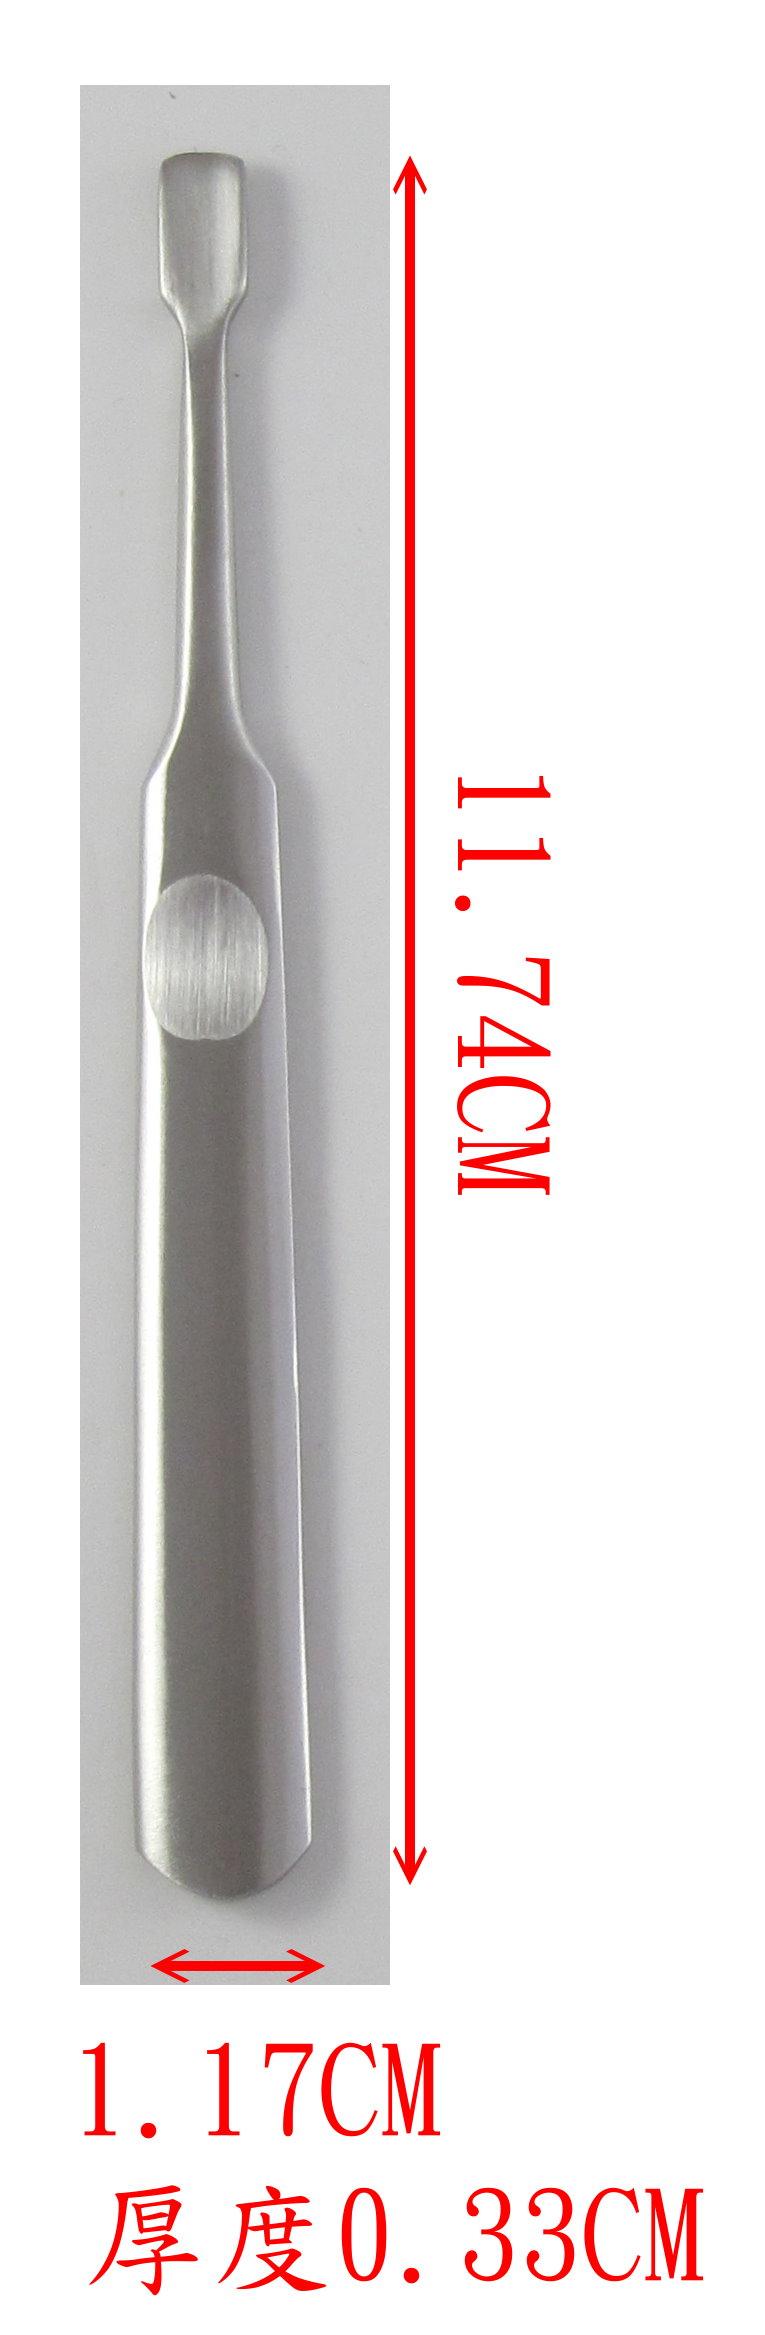 K2589.jpg